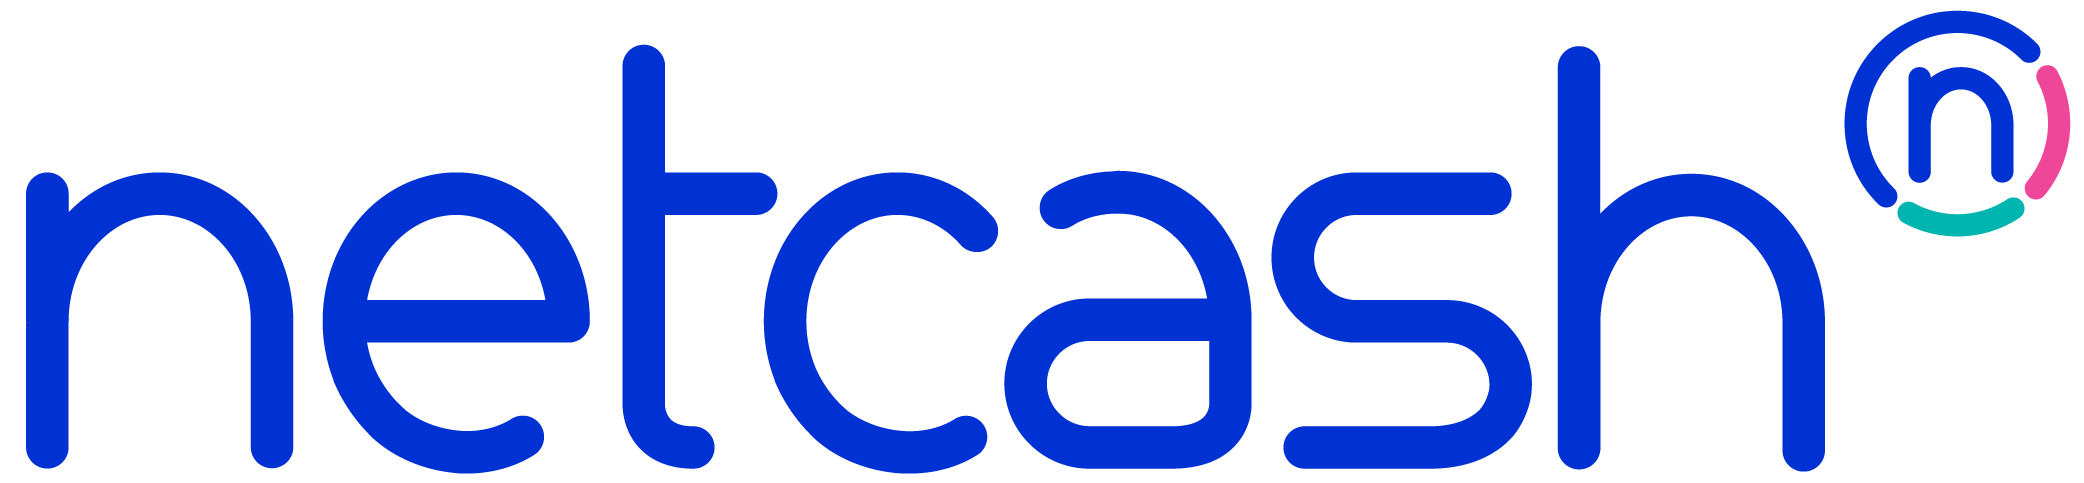 Netcash - FBA Software